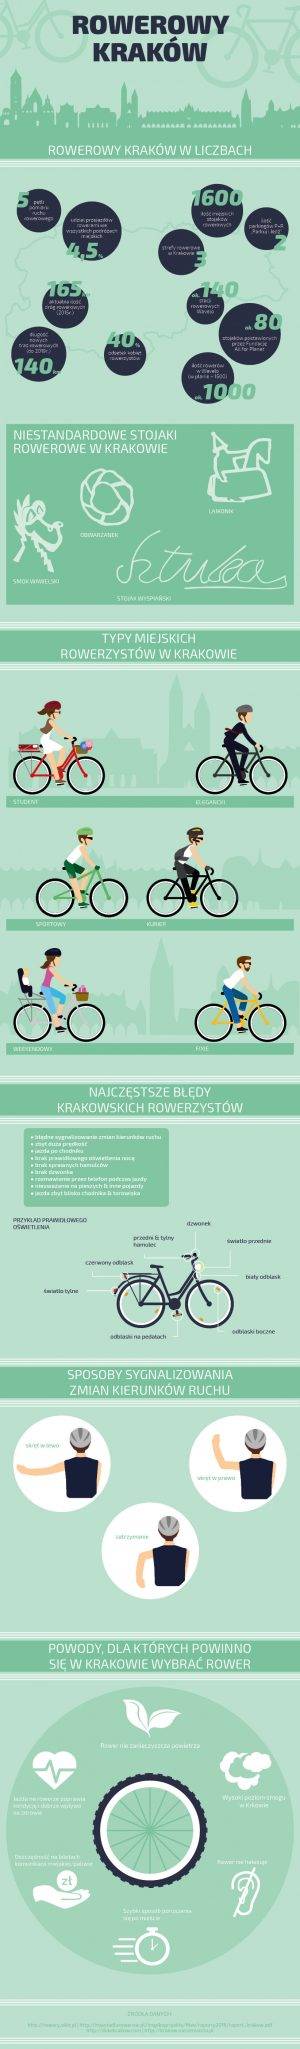 infograpic_krakow_02 (1)